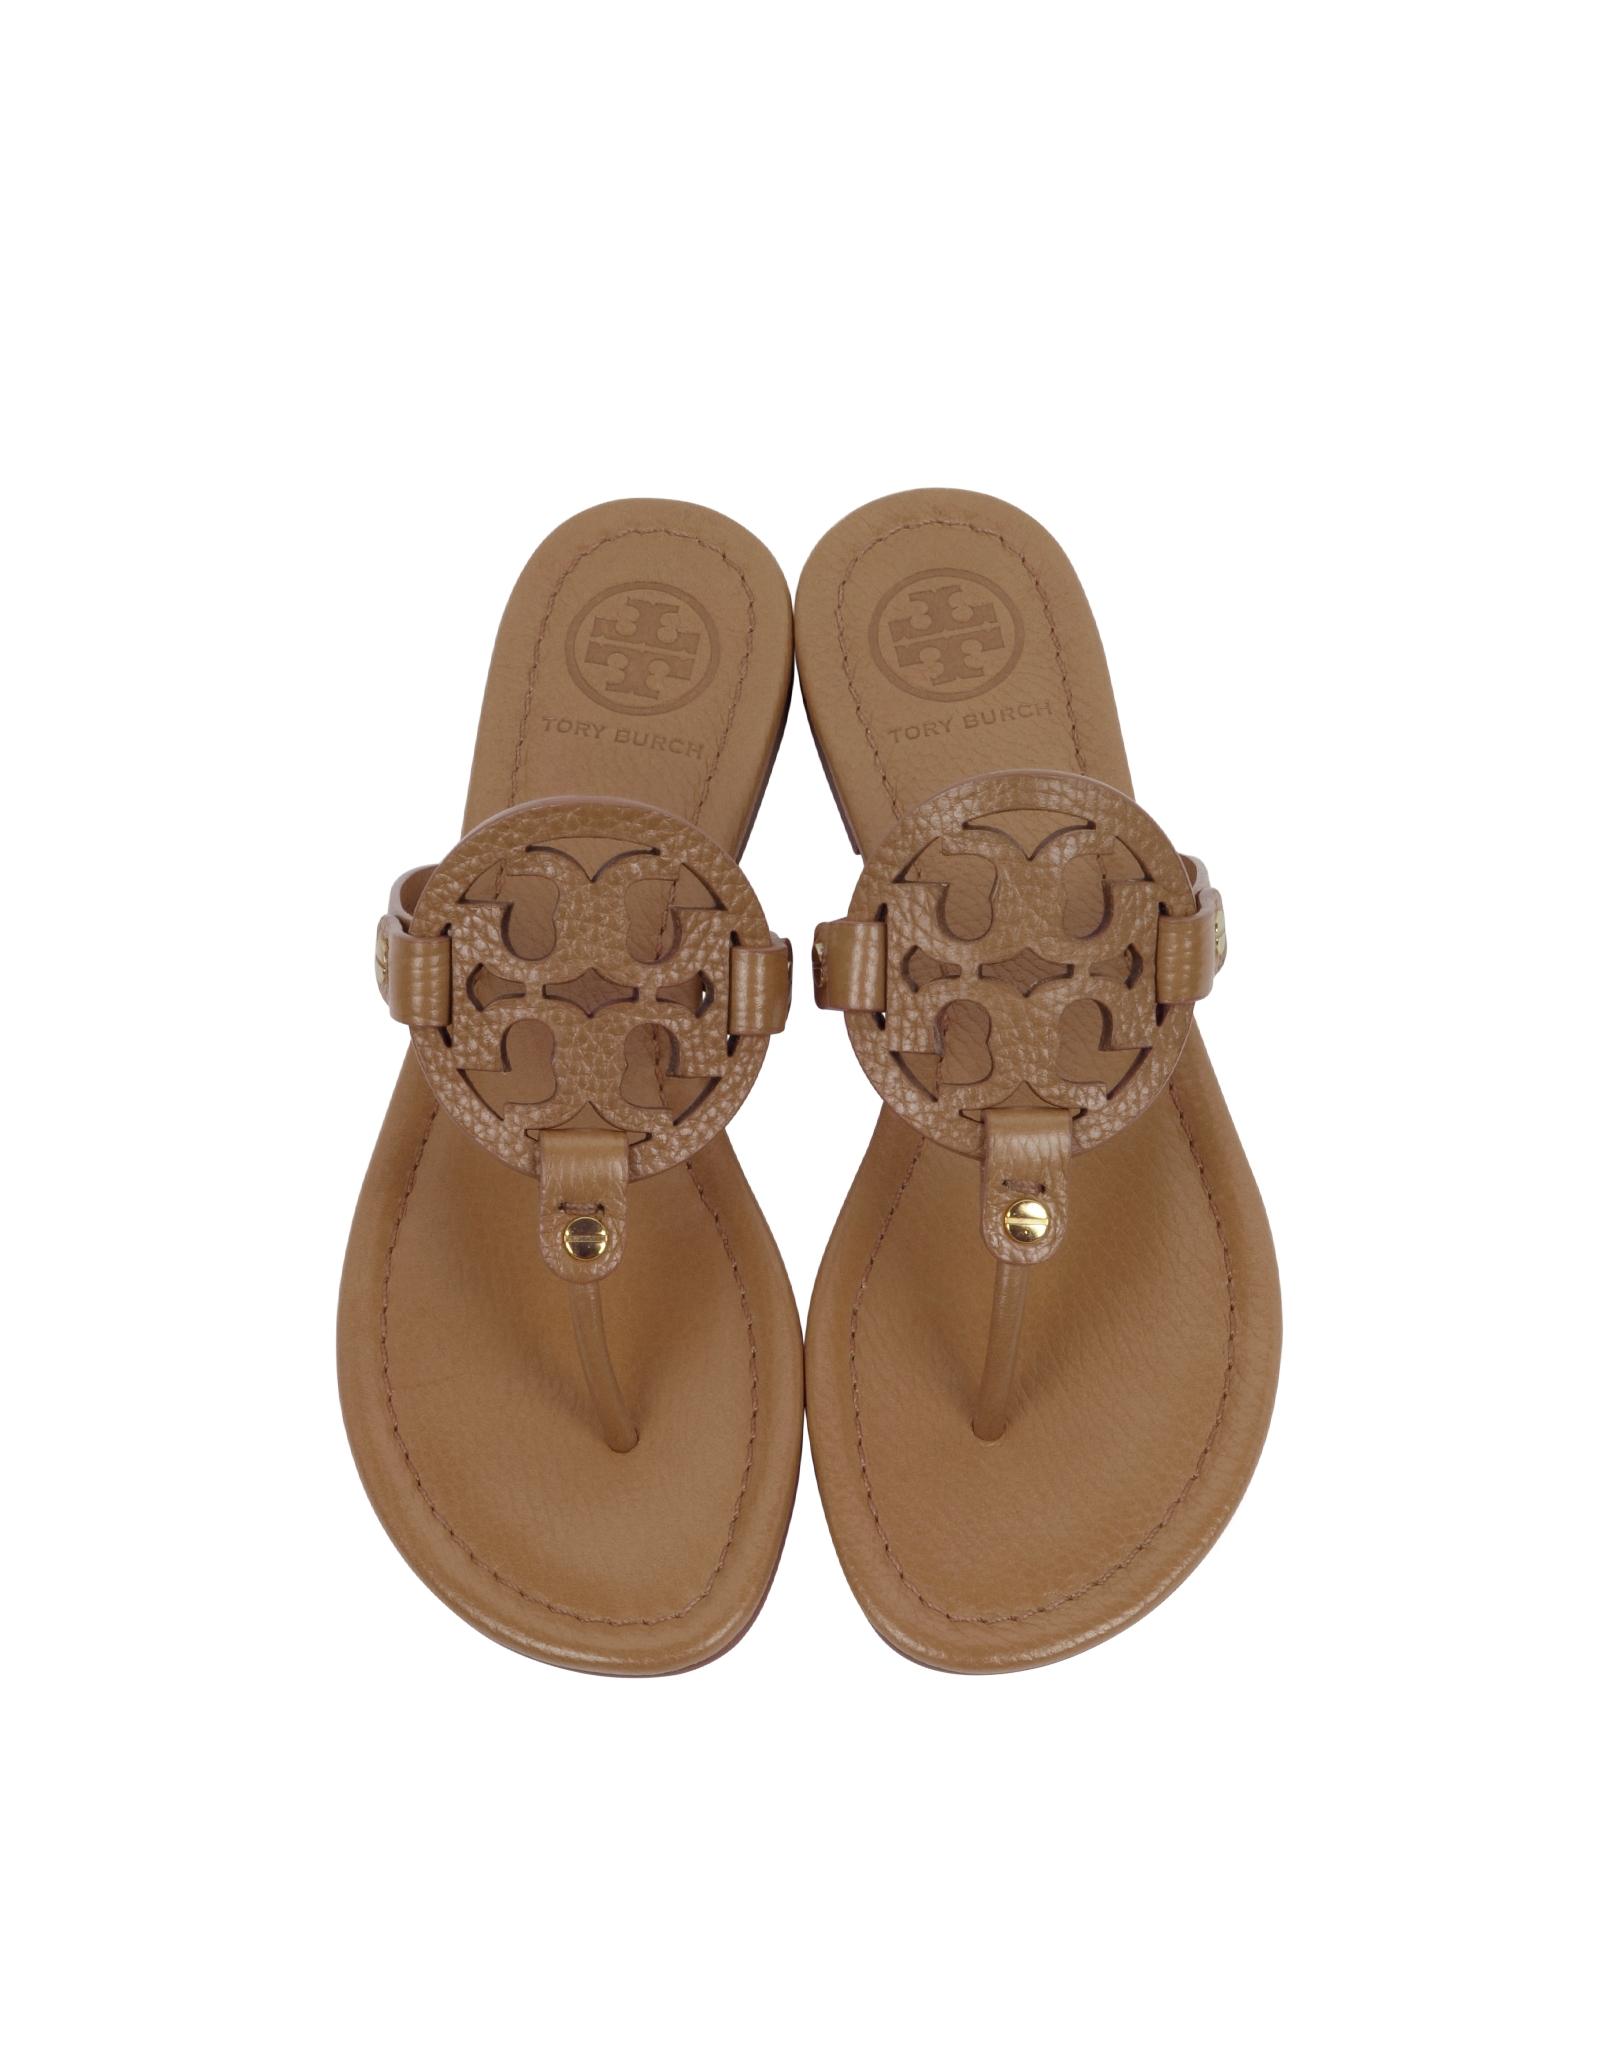 f1adb6190 Tory Burch Miller Royal Tan Leather Sandal in Brown - Lyst